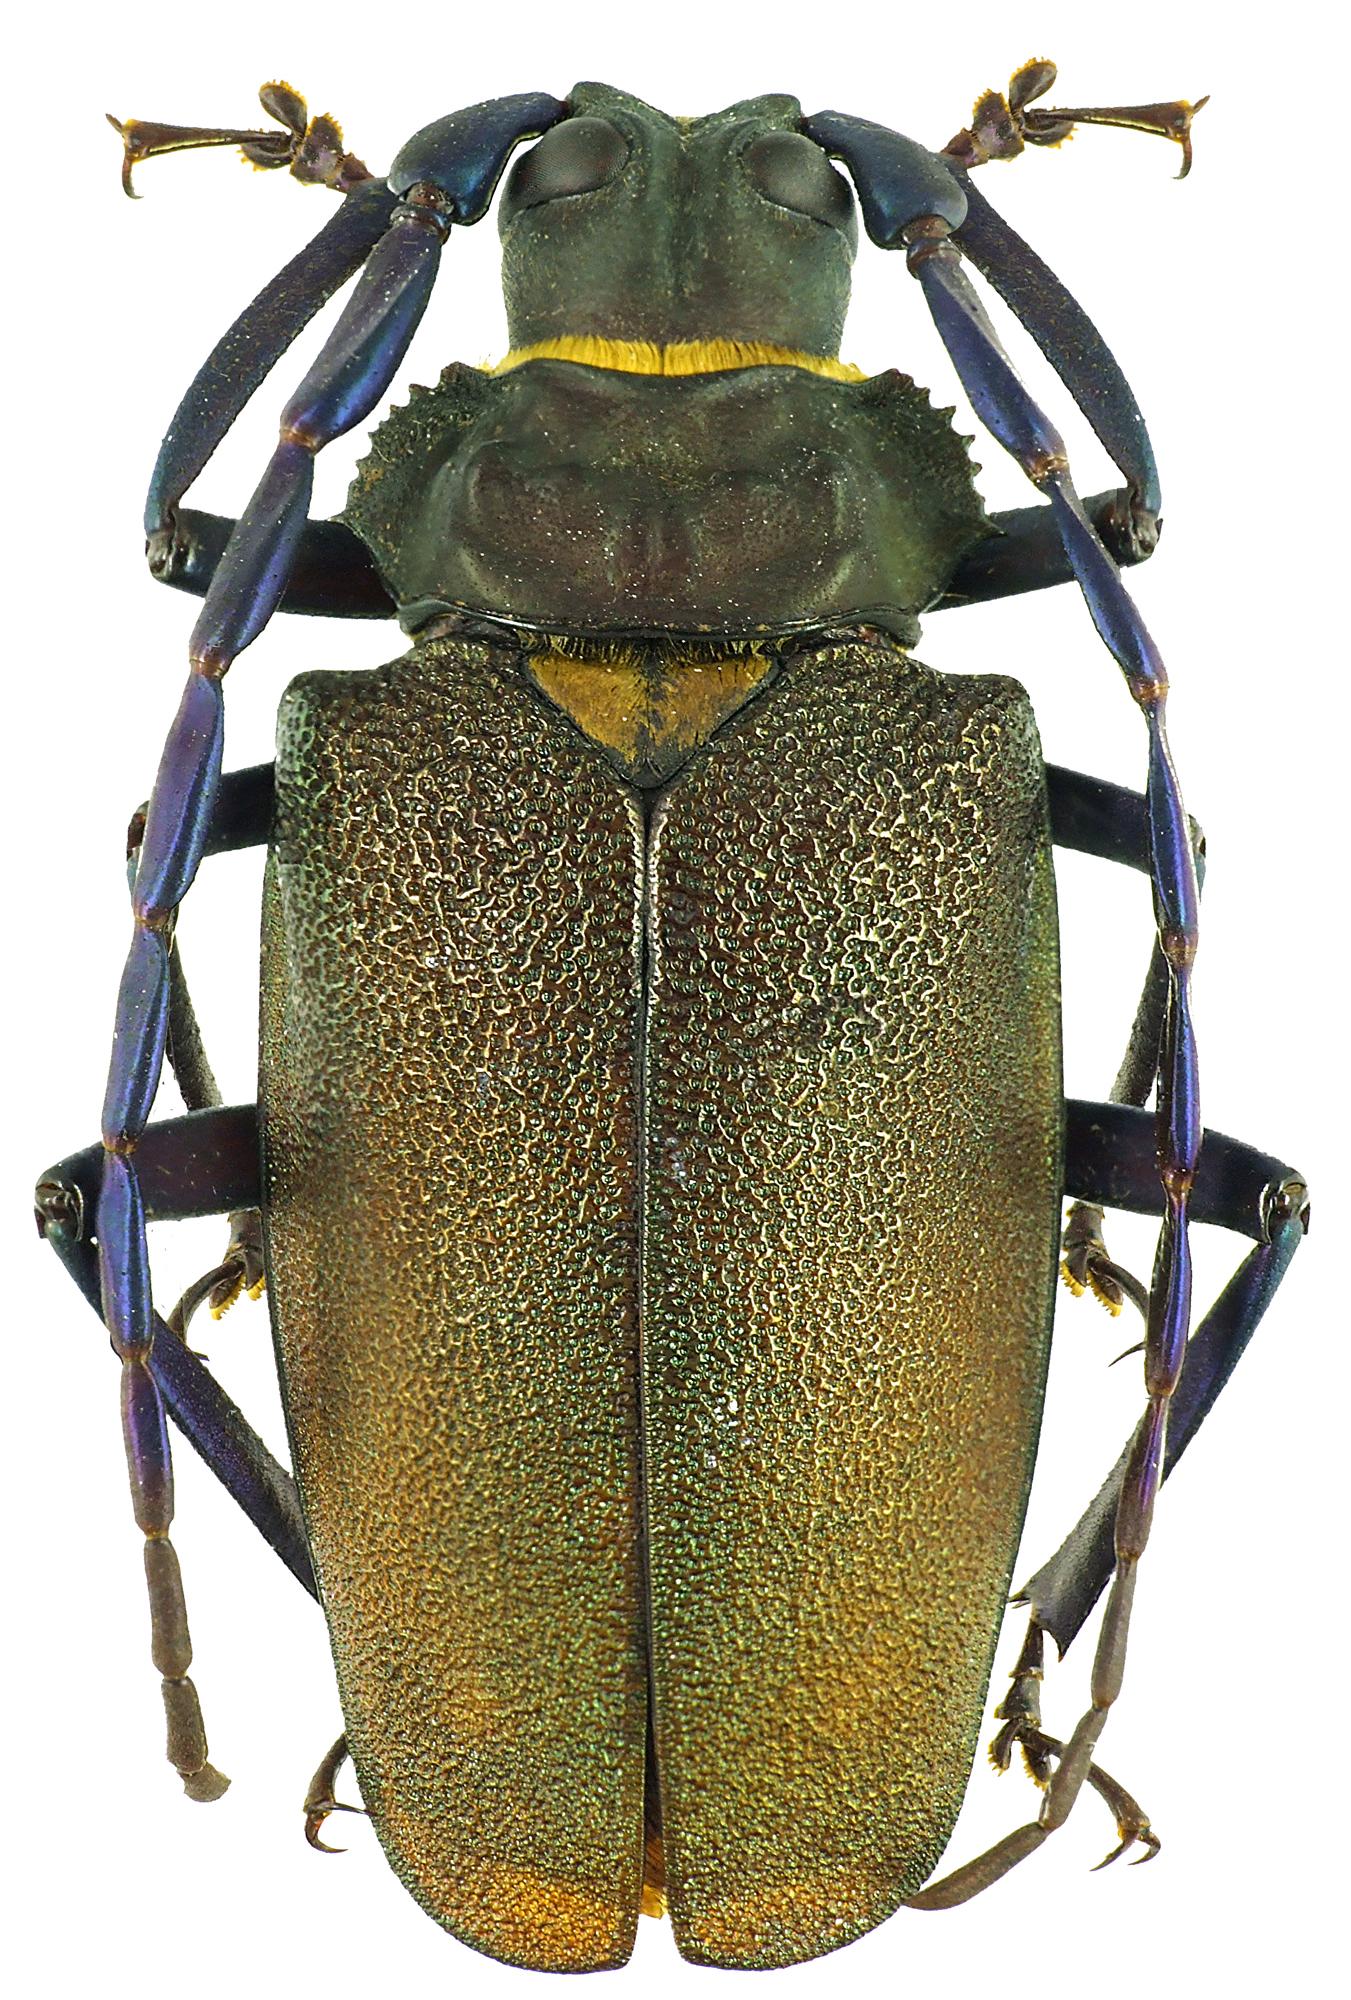 Mallaspis scutellaris 47144cz48.jpg